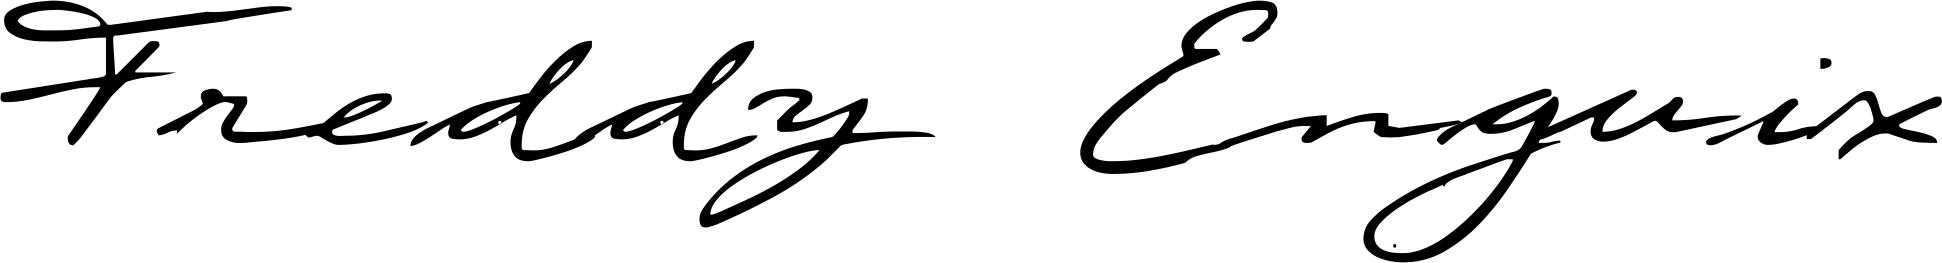 Freddy Enguix Signature